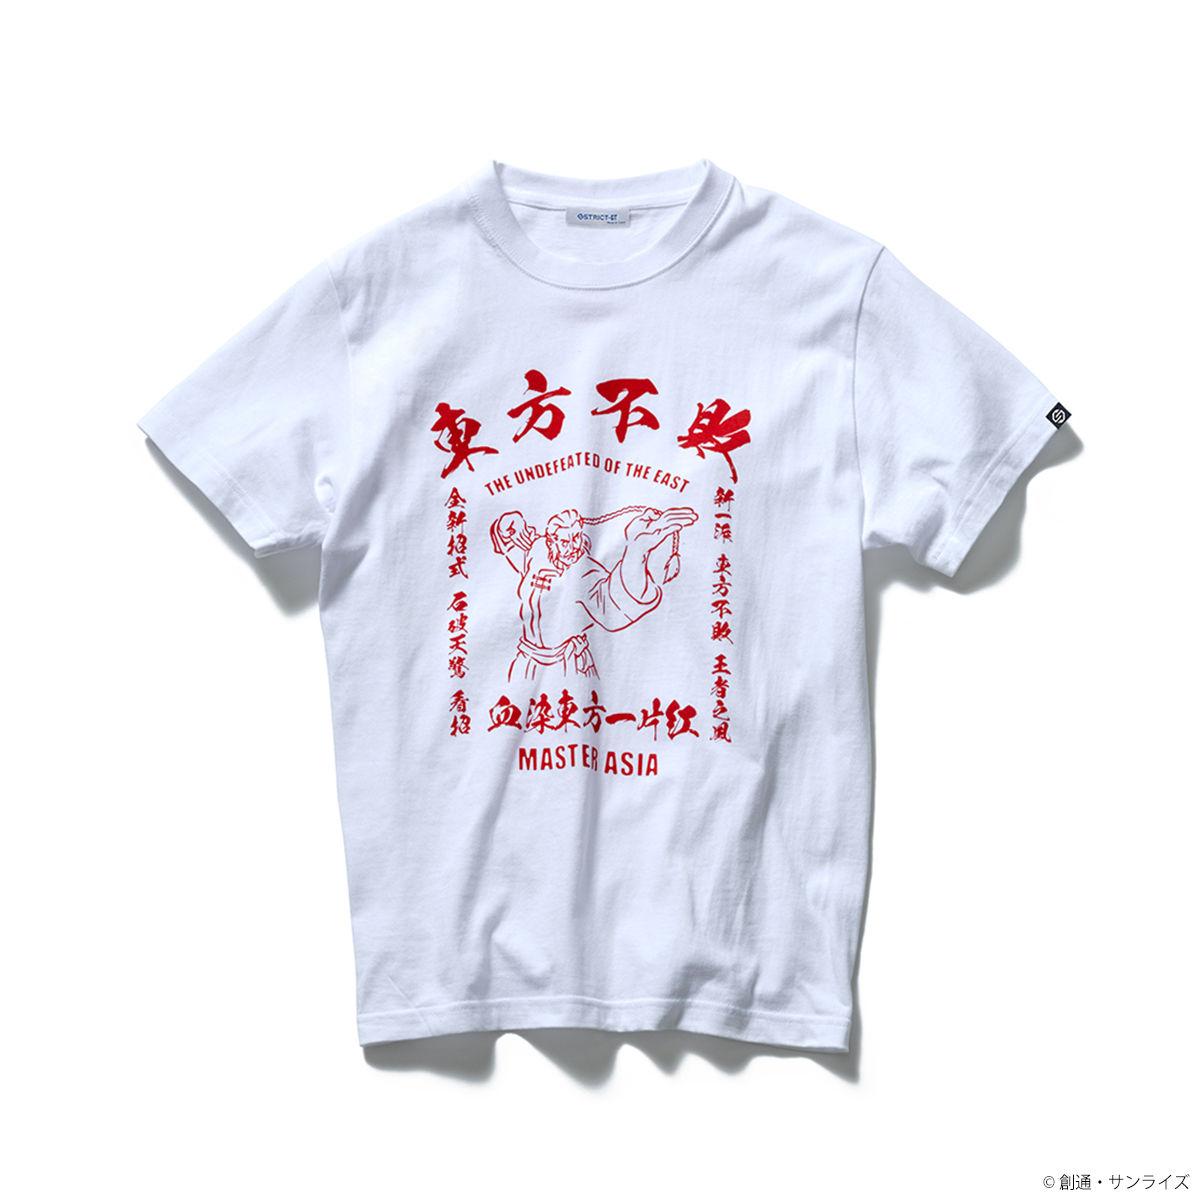 Master Asia T-shirt—Mobile Fighter G Gundam/STRICT-G Collaboration